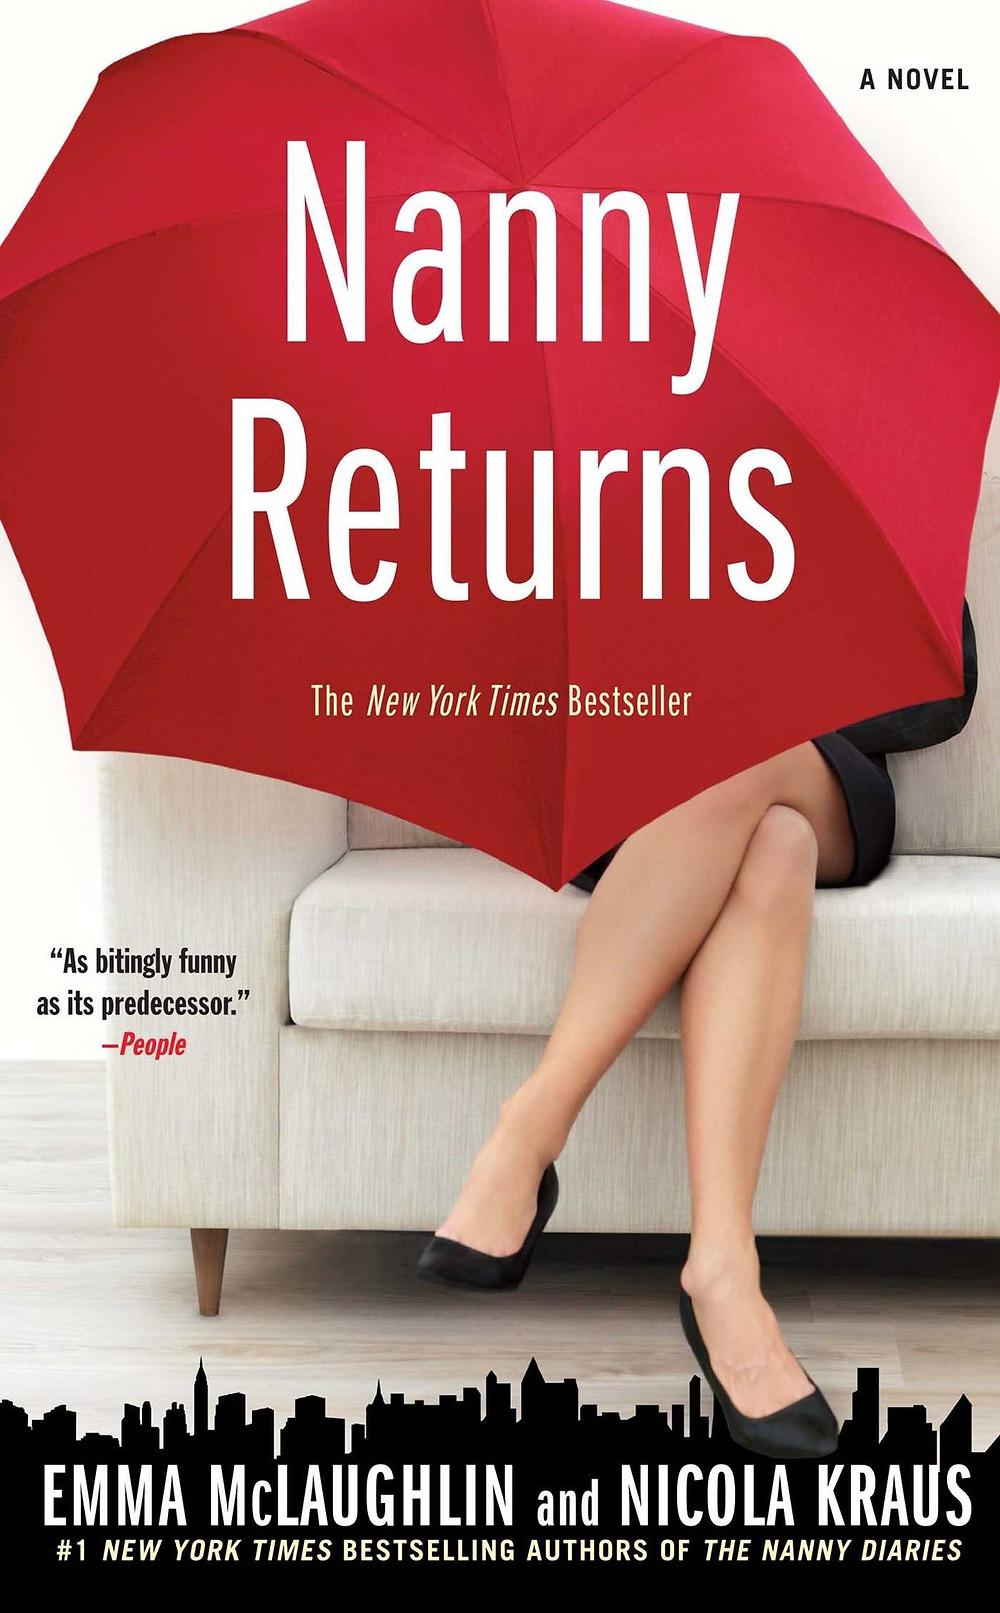 Nanny Returns Emma McLaughlin (Author)  Nicola Kraus (Author) the bookslut friday book debreif book reviews thebookslut